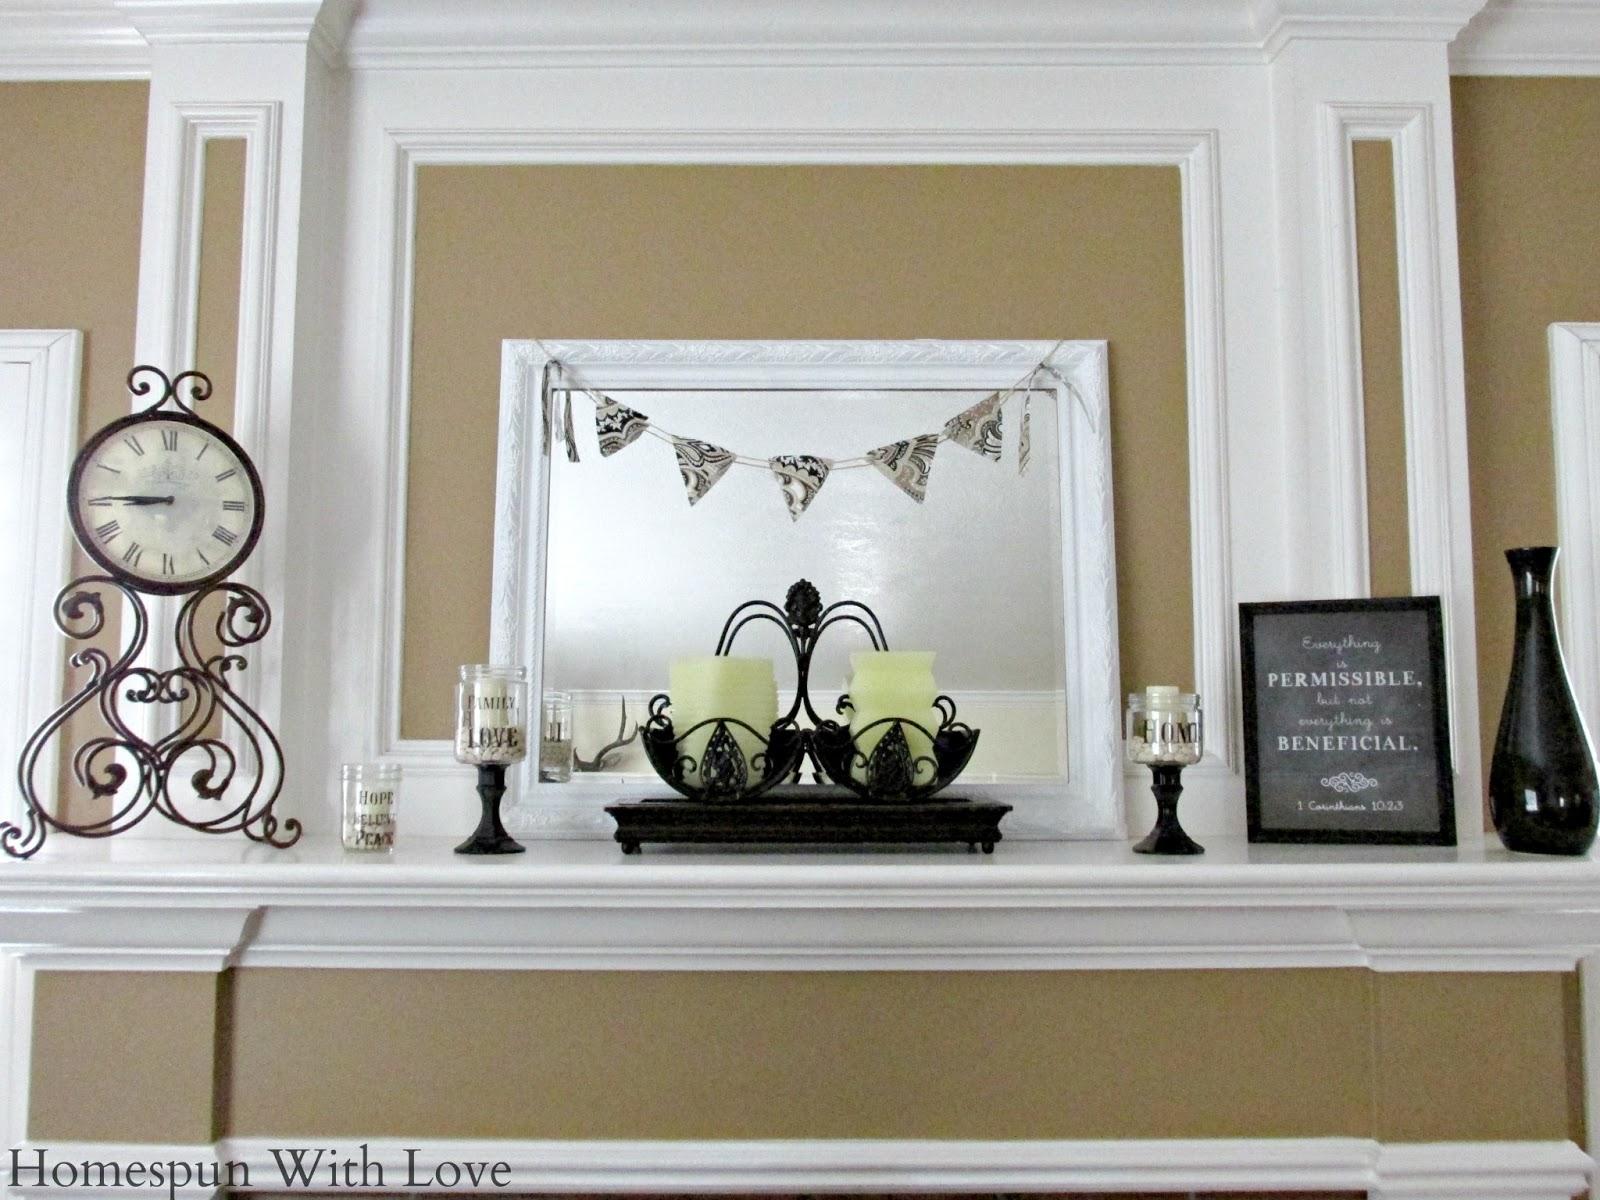 Homespun With Love Home Decor Black White Summertime